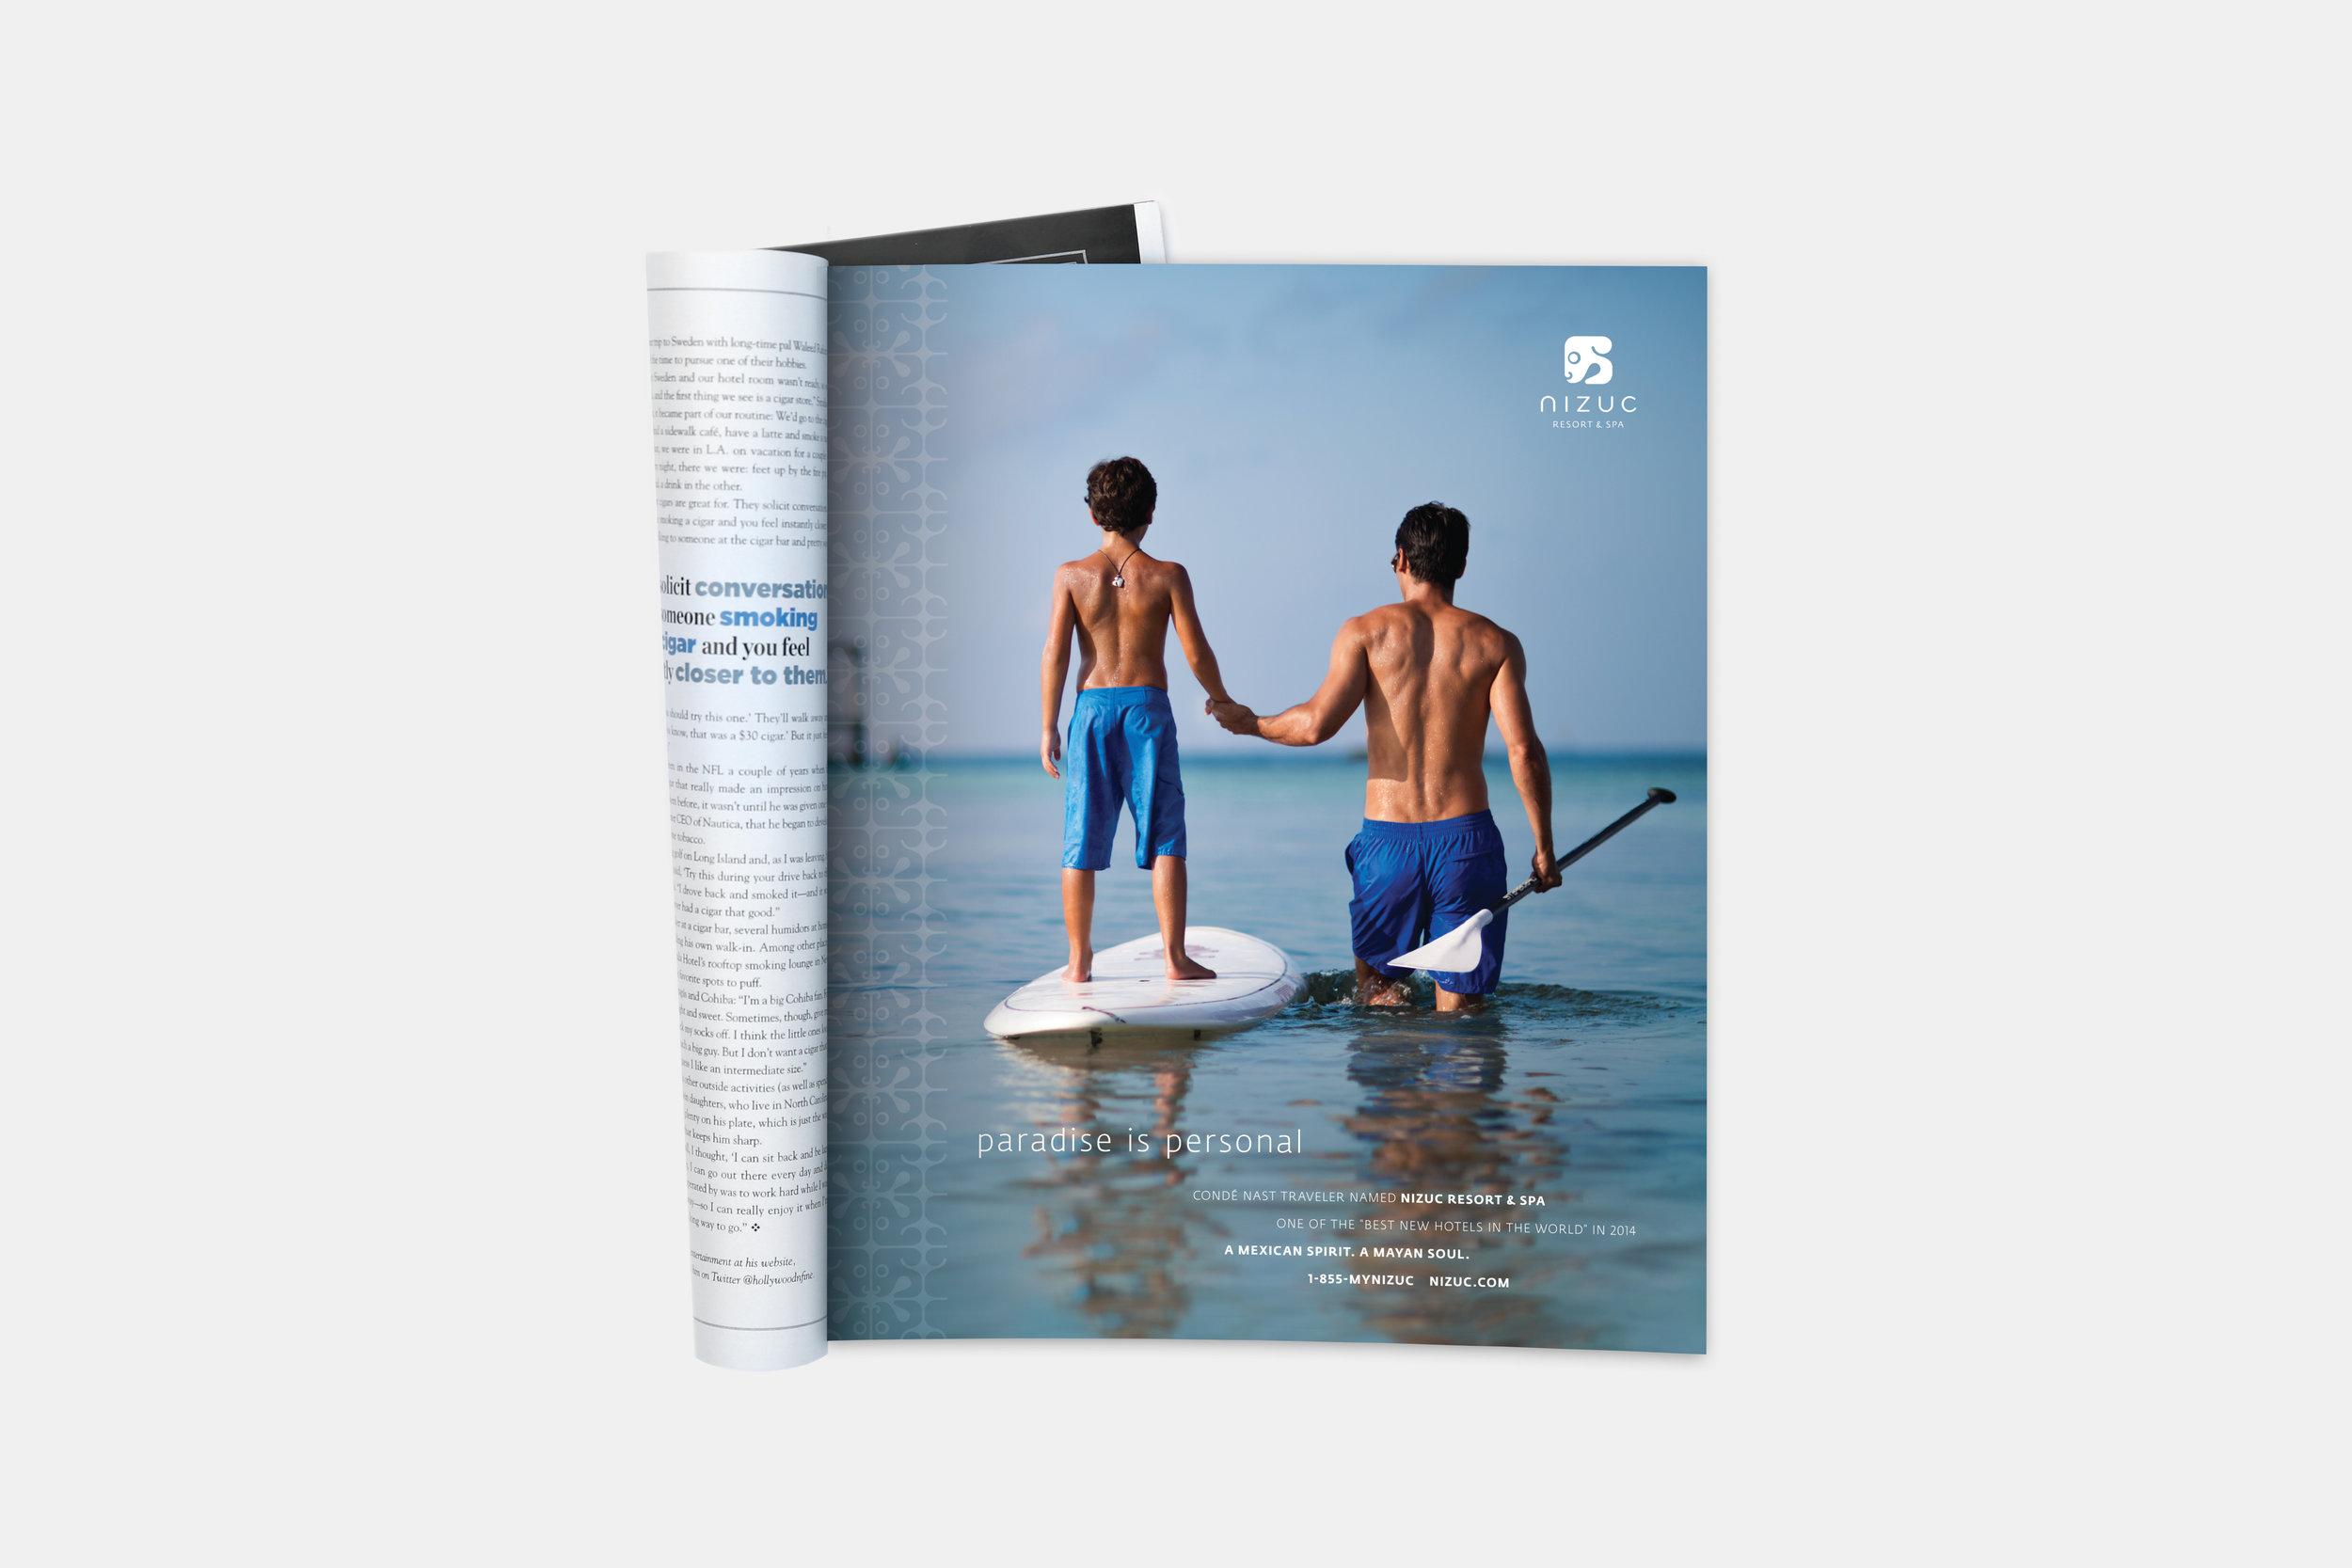 2_NIZUC_magazine advert.jpg